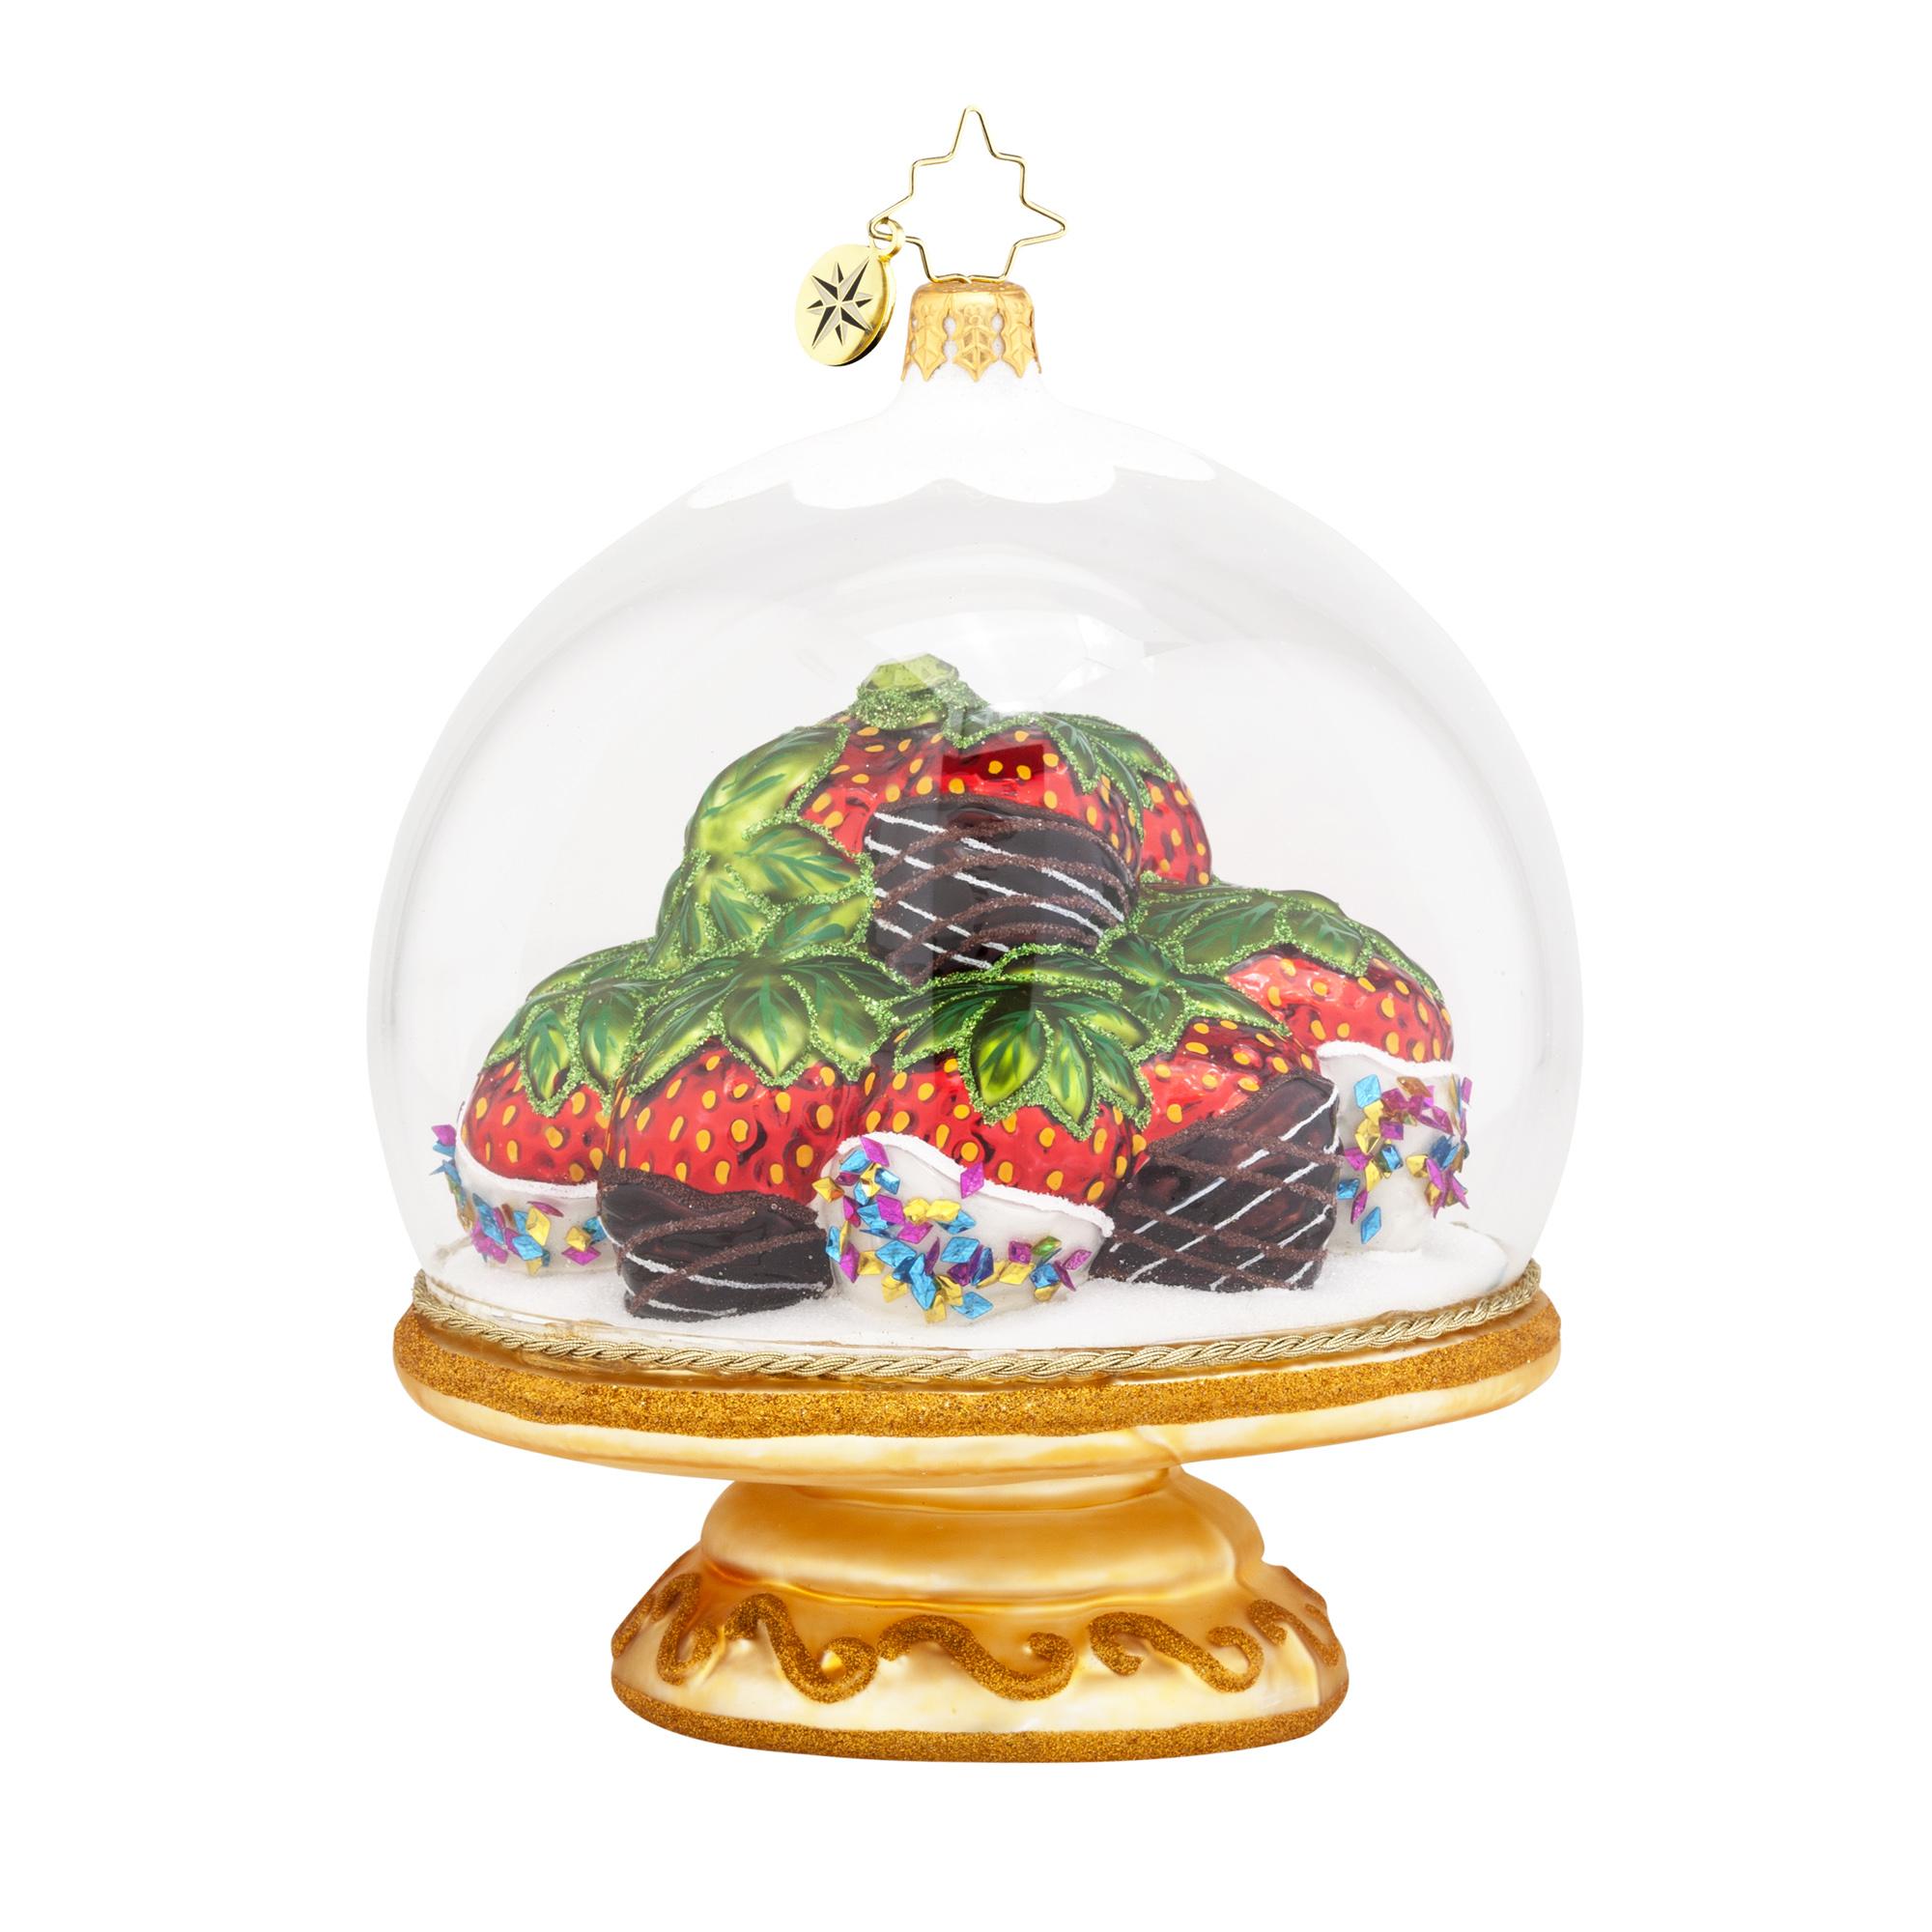 chocolate covered strawberries price list